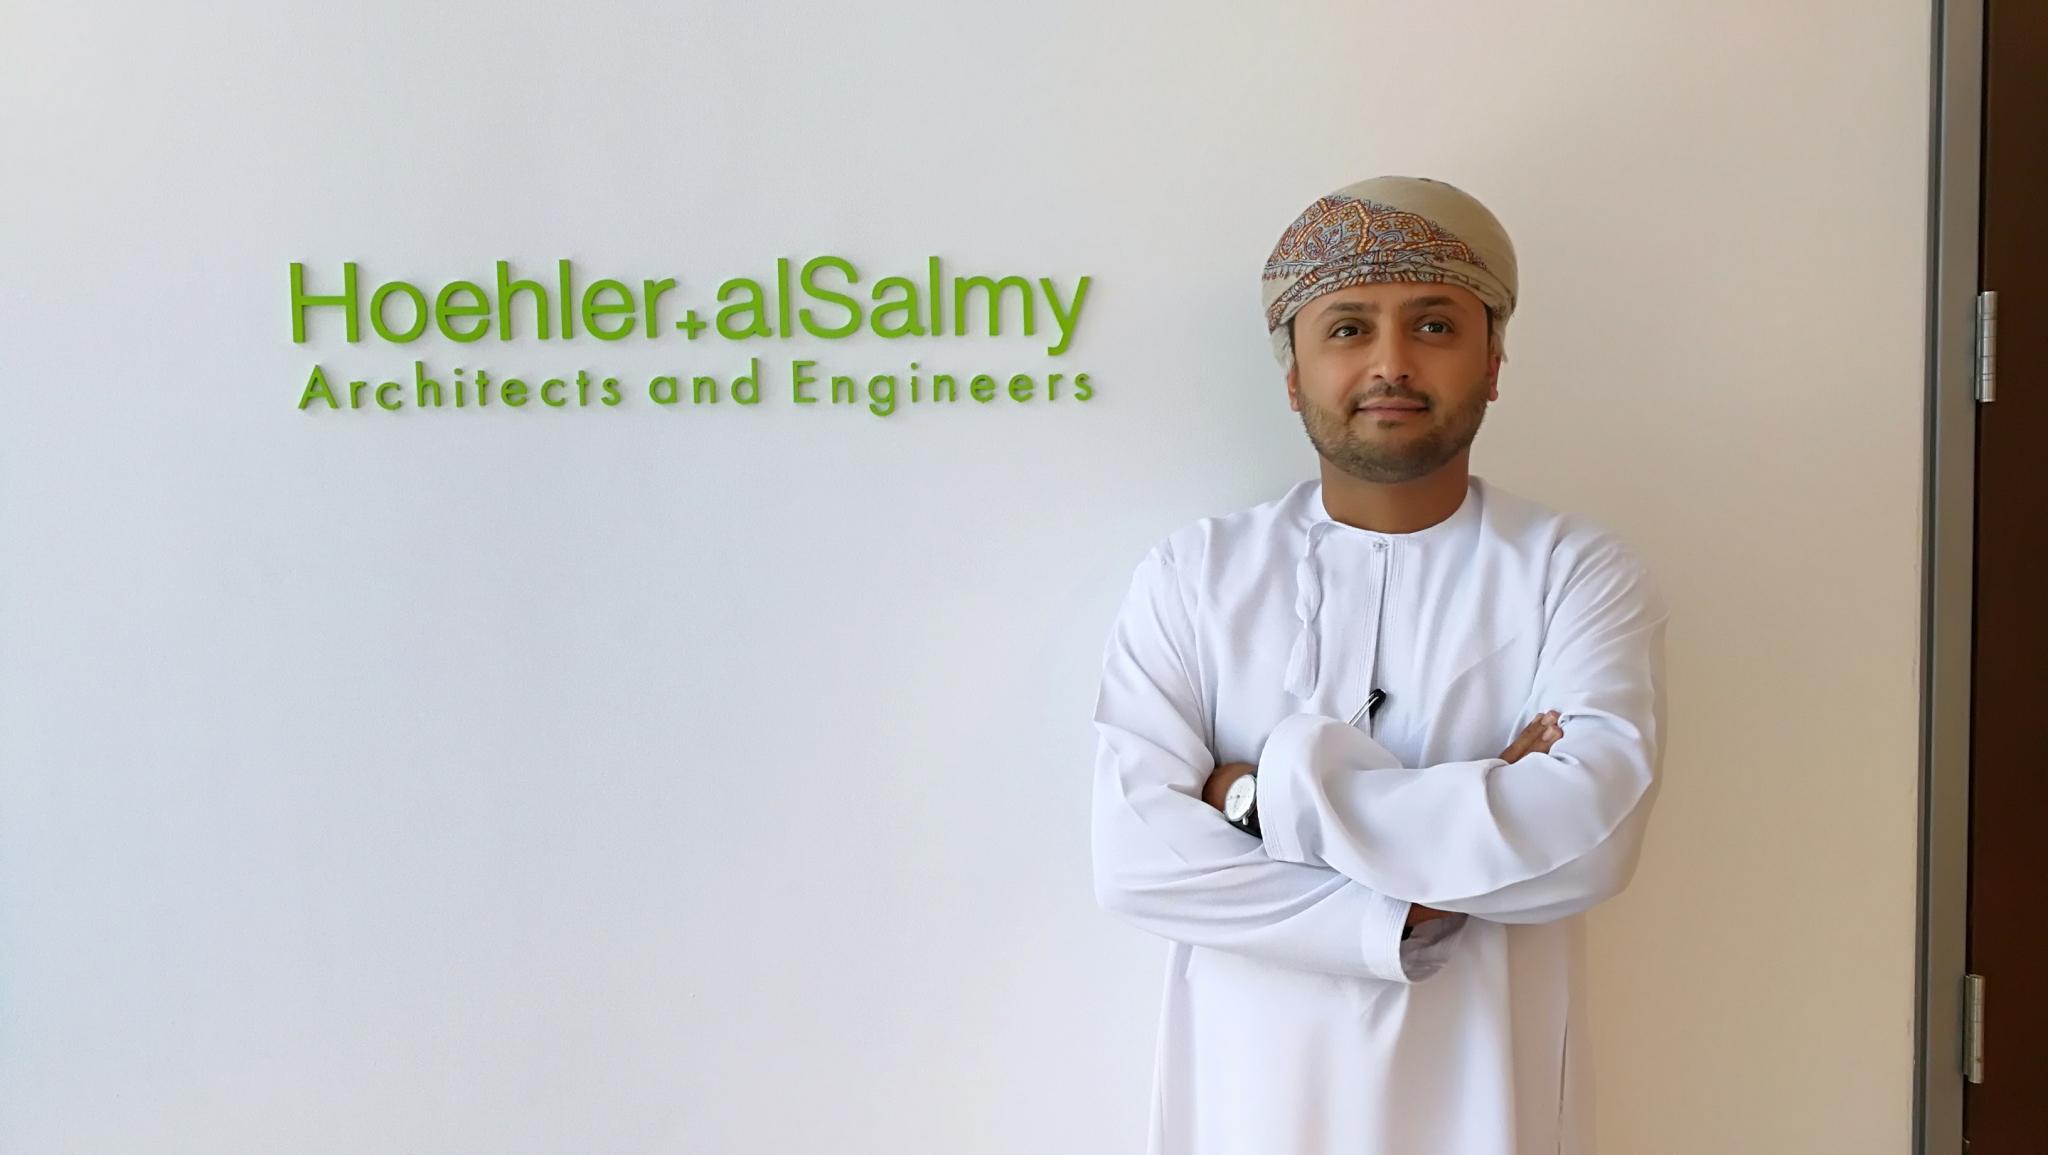 #43: Muhammad AlSalmy, Hoehler + alSalmy